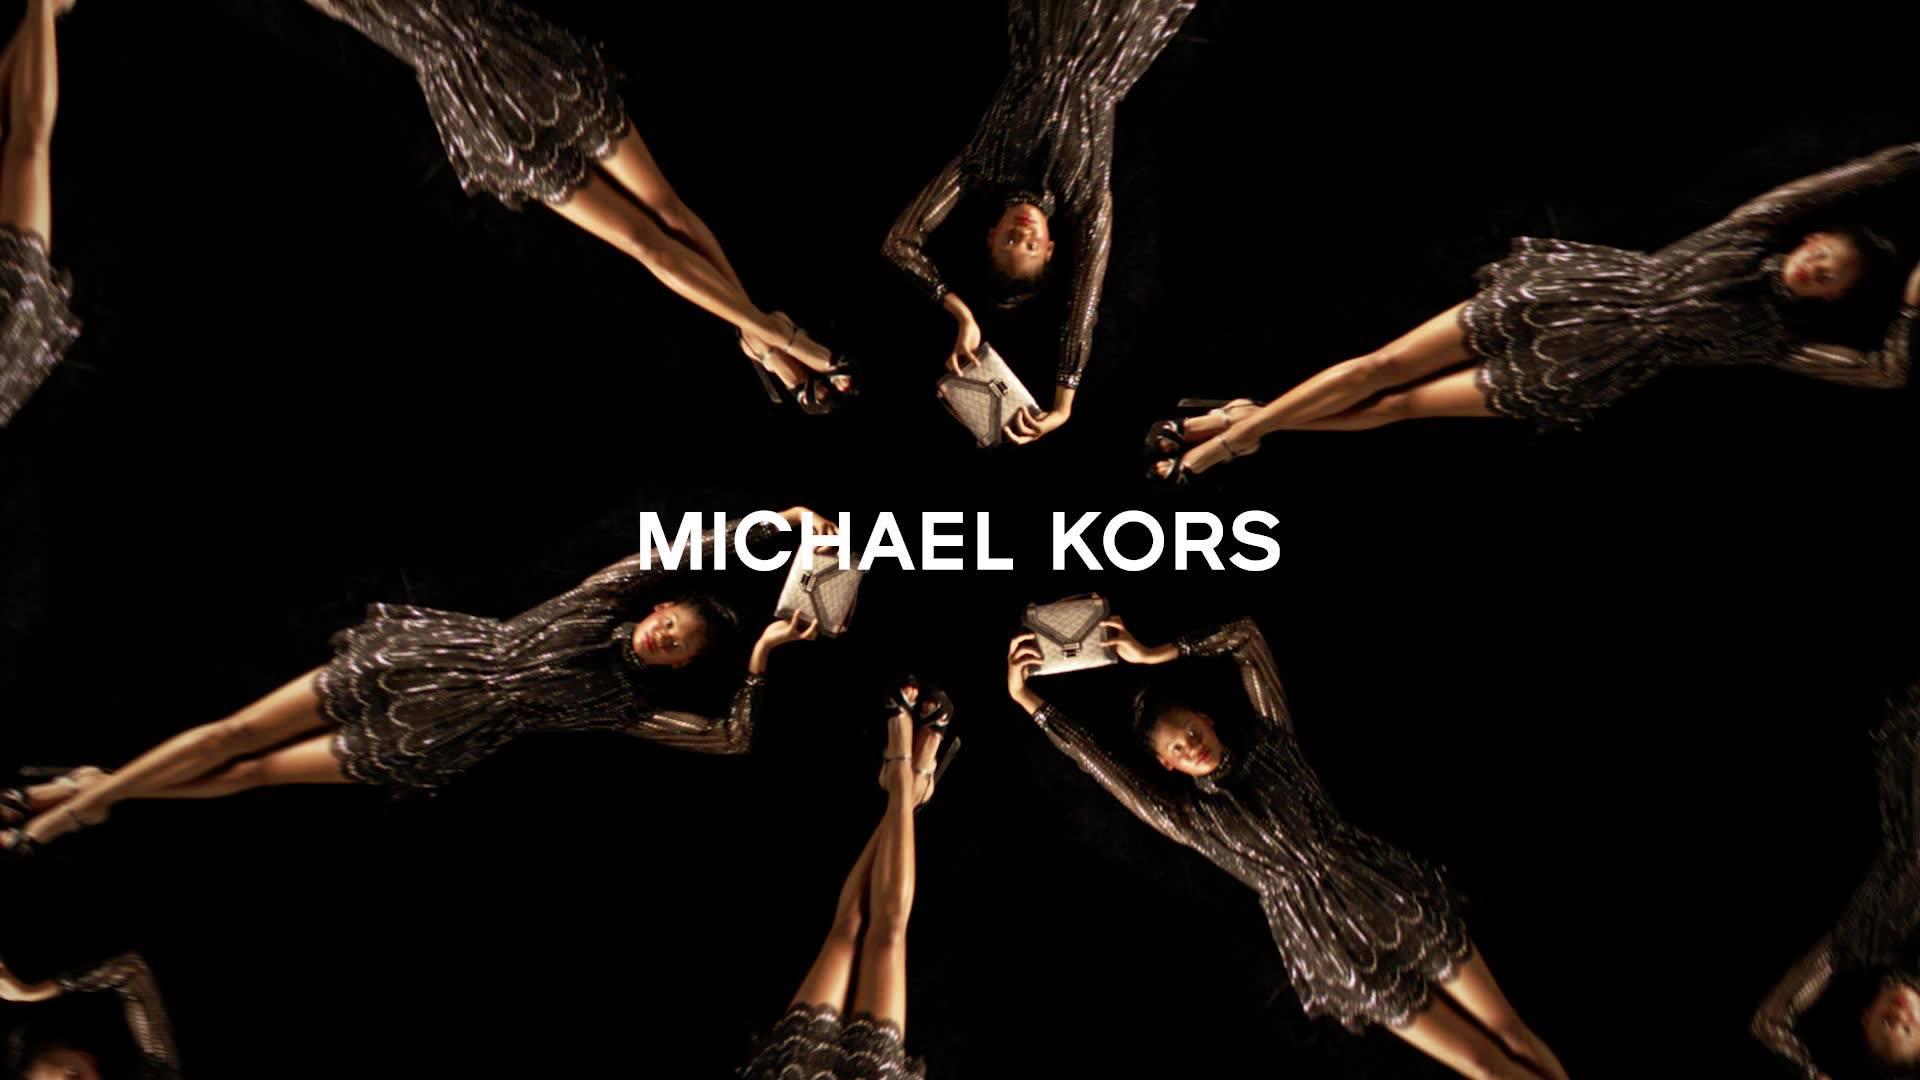 michael kors-gallery